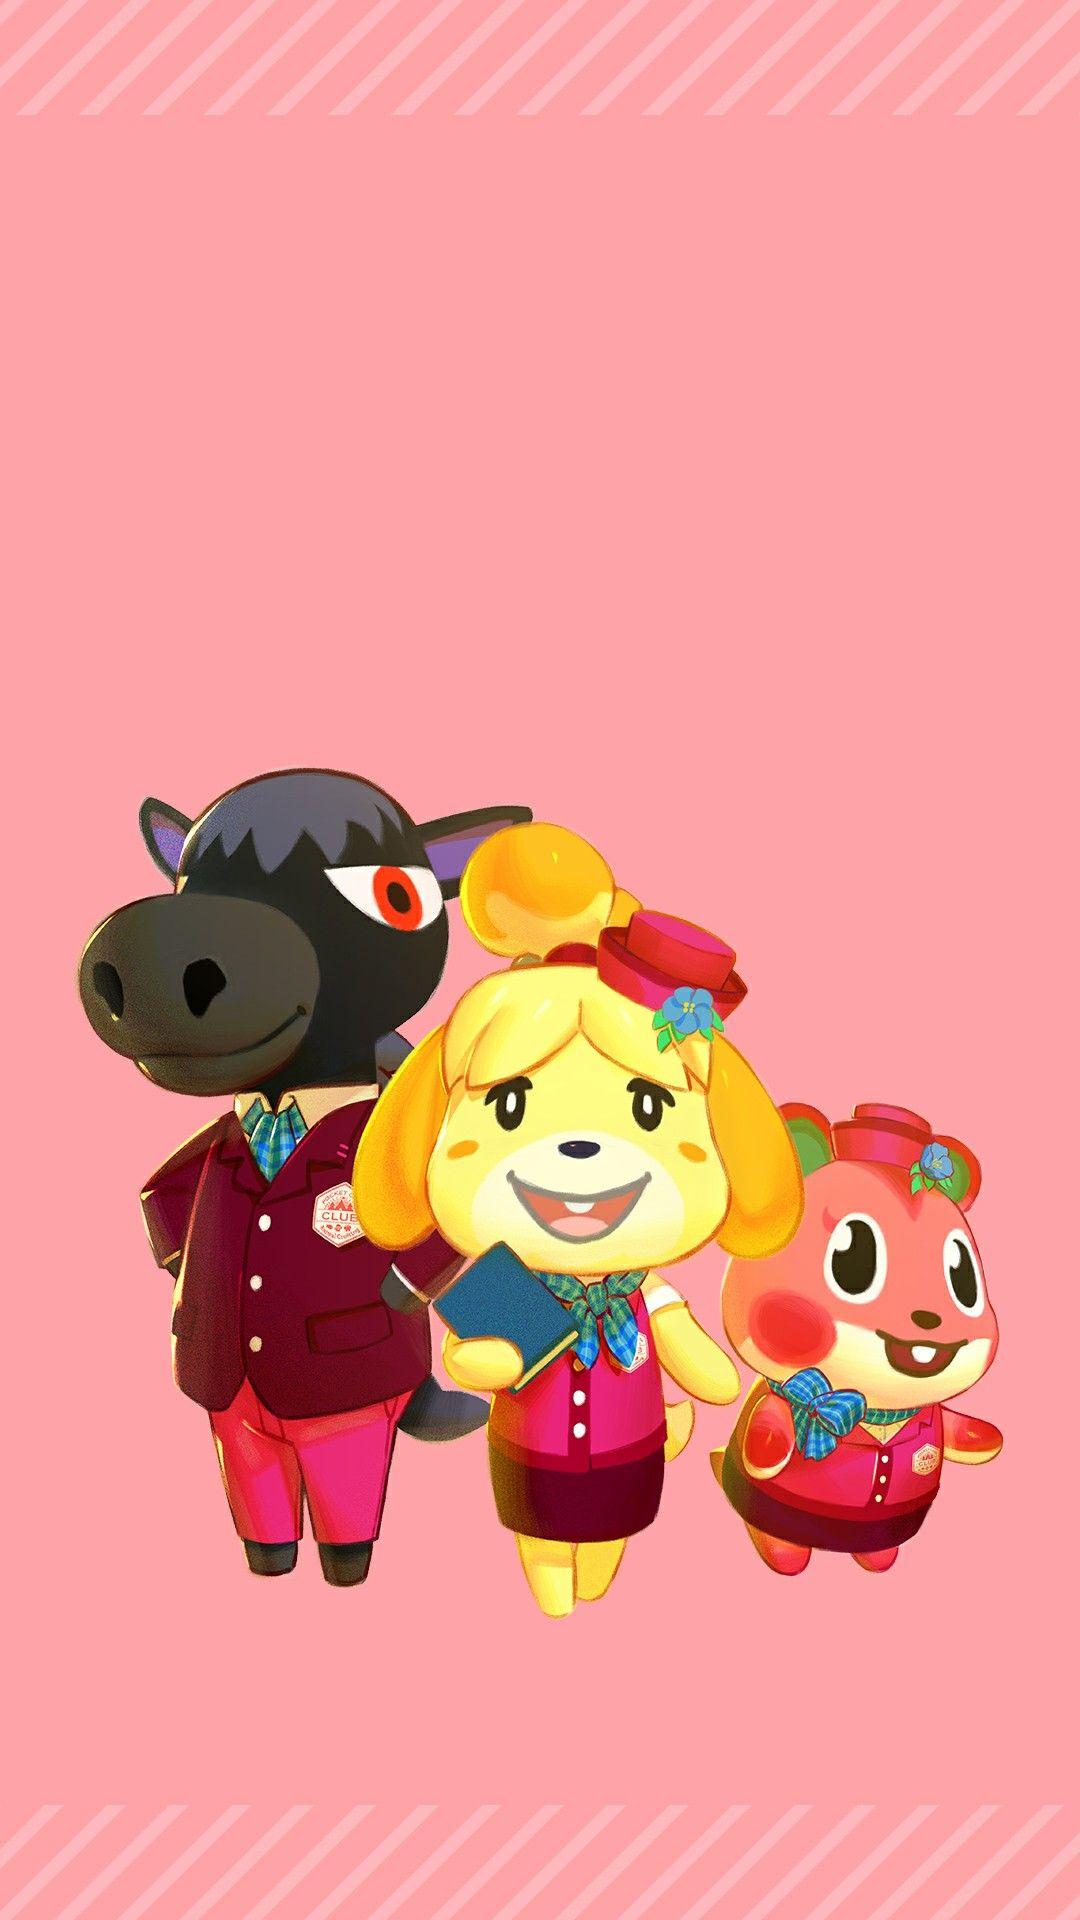 2019 Novemb Smartphone 1920 X 1080 Animal Crossing Pocket Camp Animal Crossing Fan Art Animal Crossing